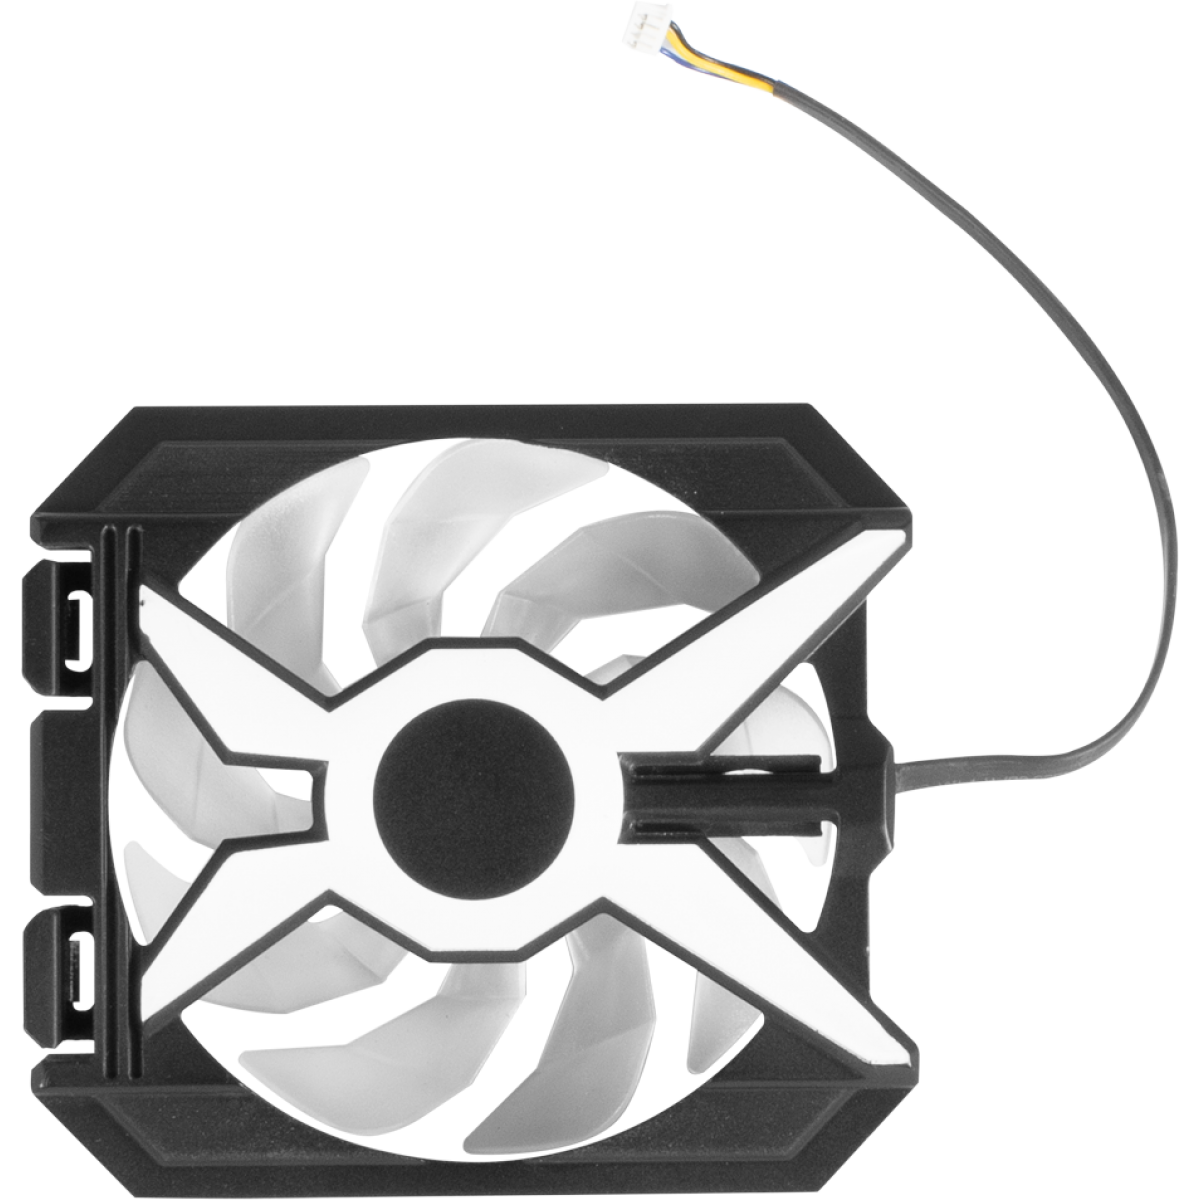 Placa de Vídeo Galax, GeForce, RTX 3080 SG, 1 Click OC, 10GB, GDDR6X, 320Bit, 38NWM3MD99NN